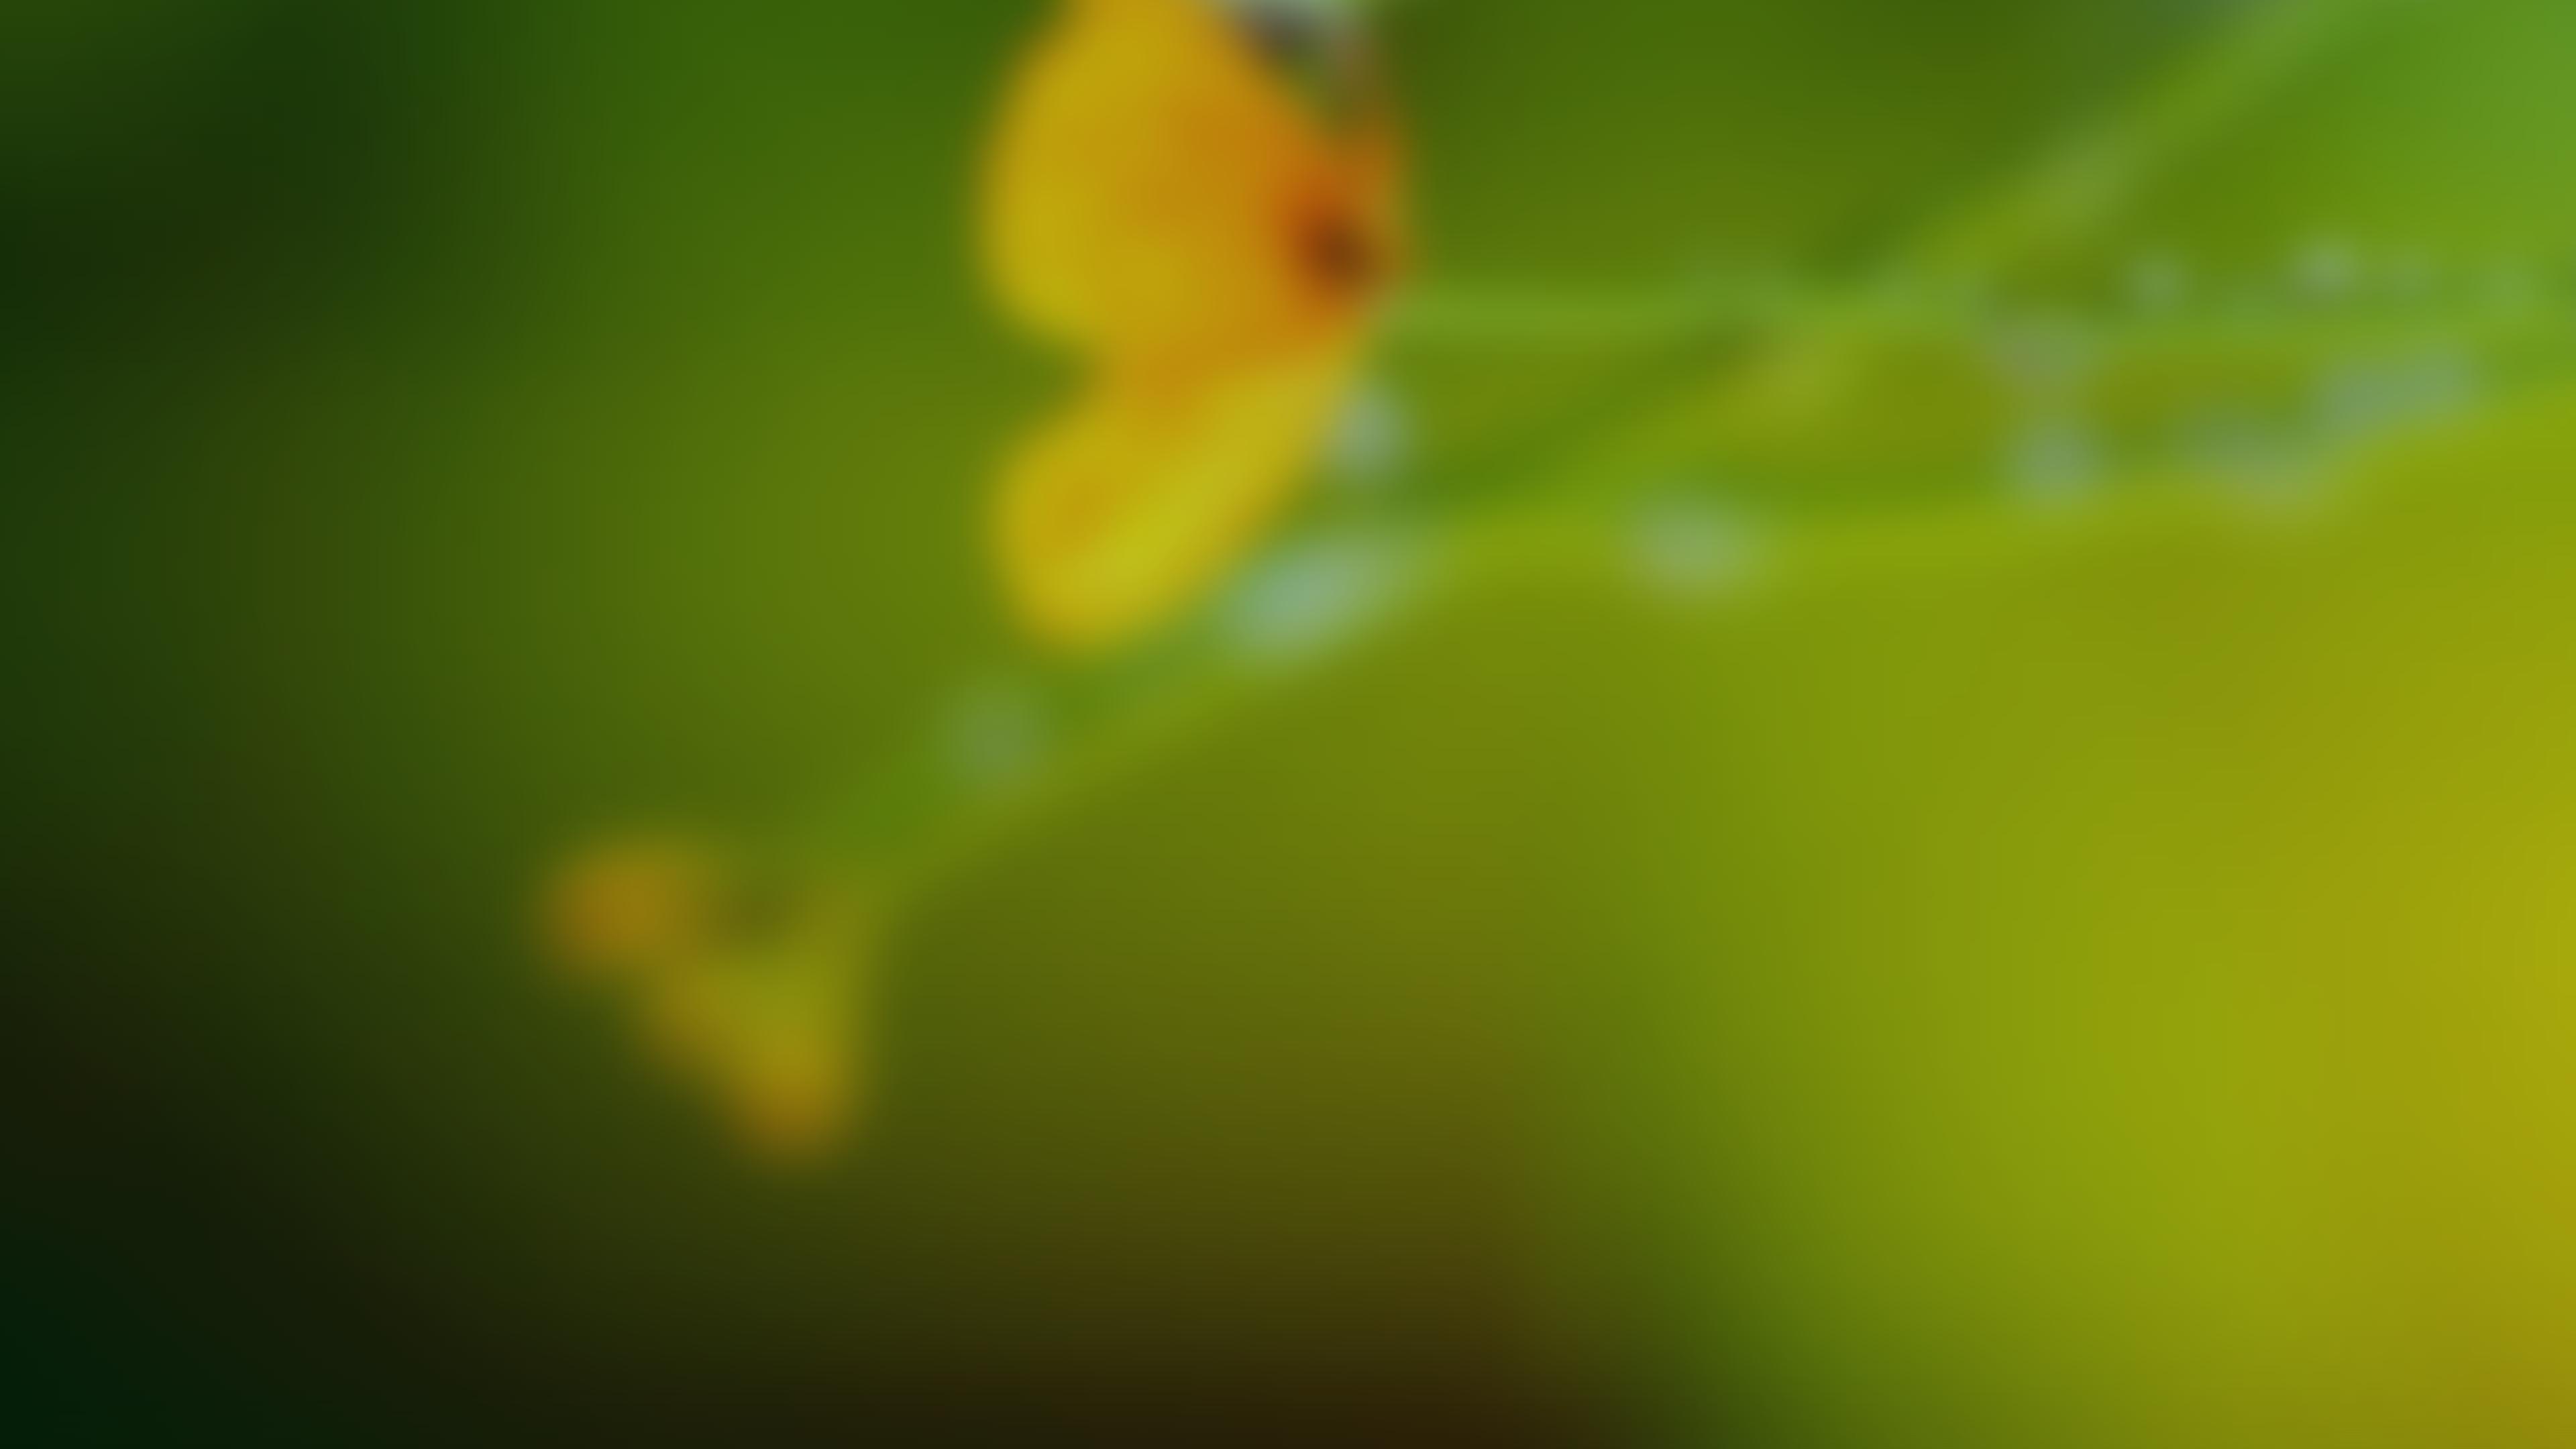 BE20200827 - Summer Celebration - banner - Correct Size - 1920px × 108